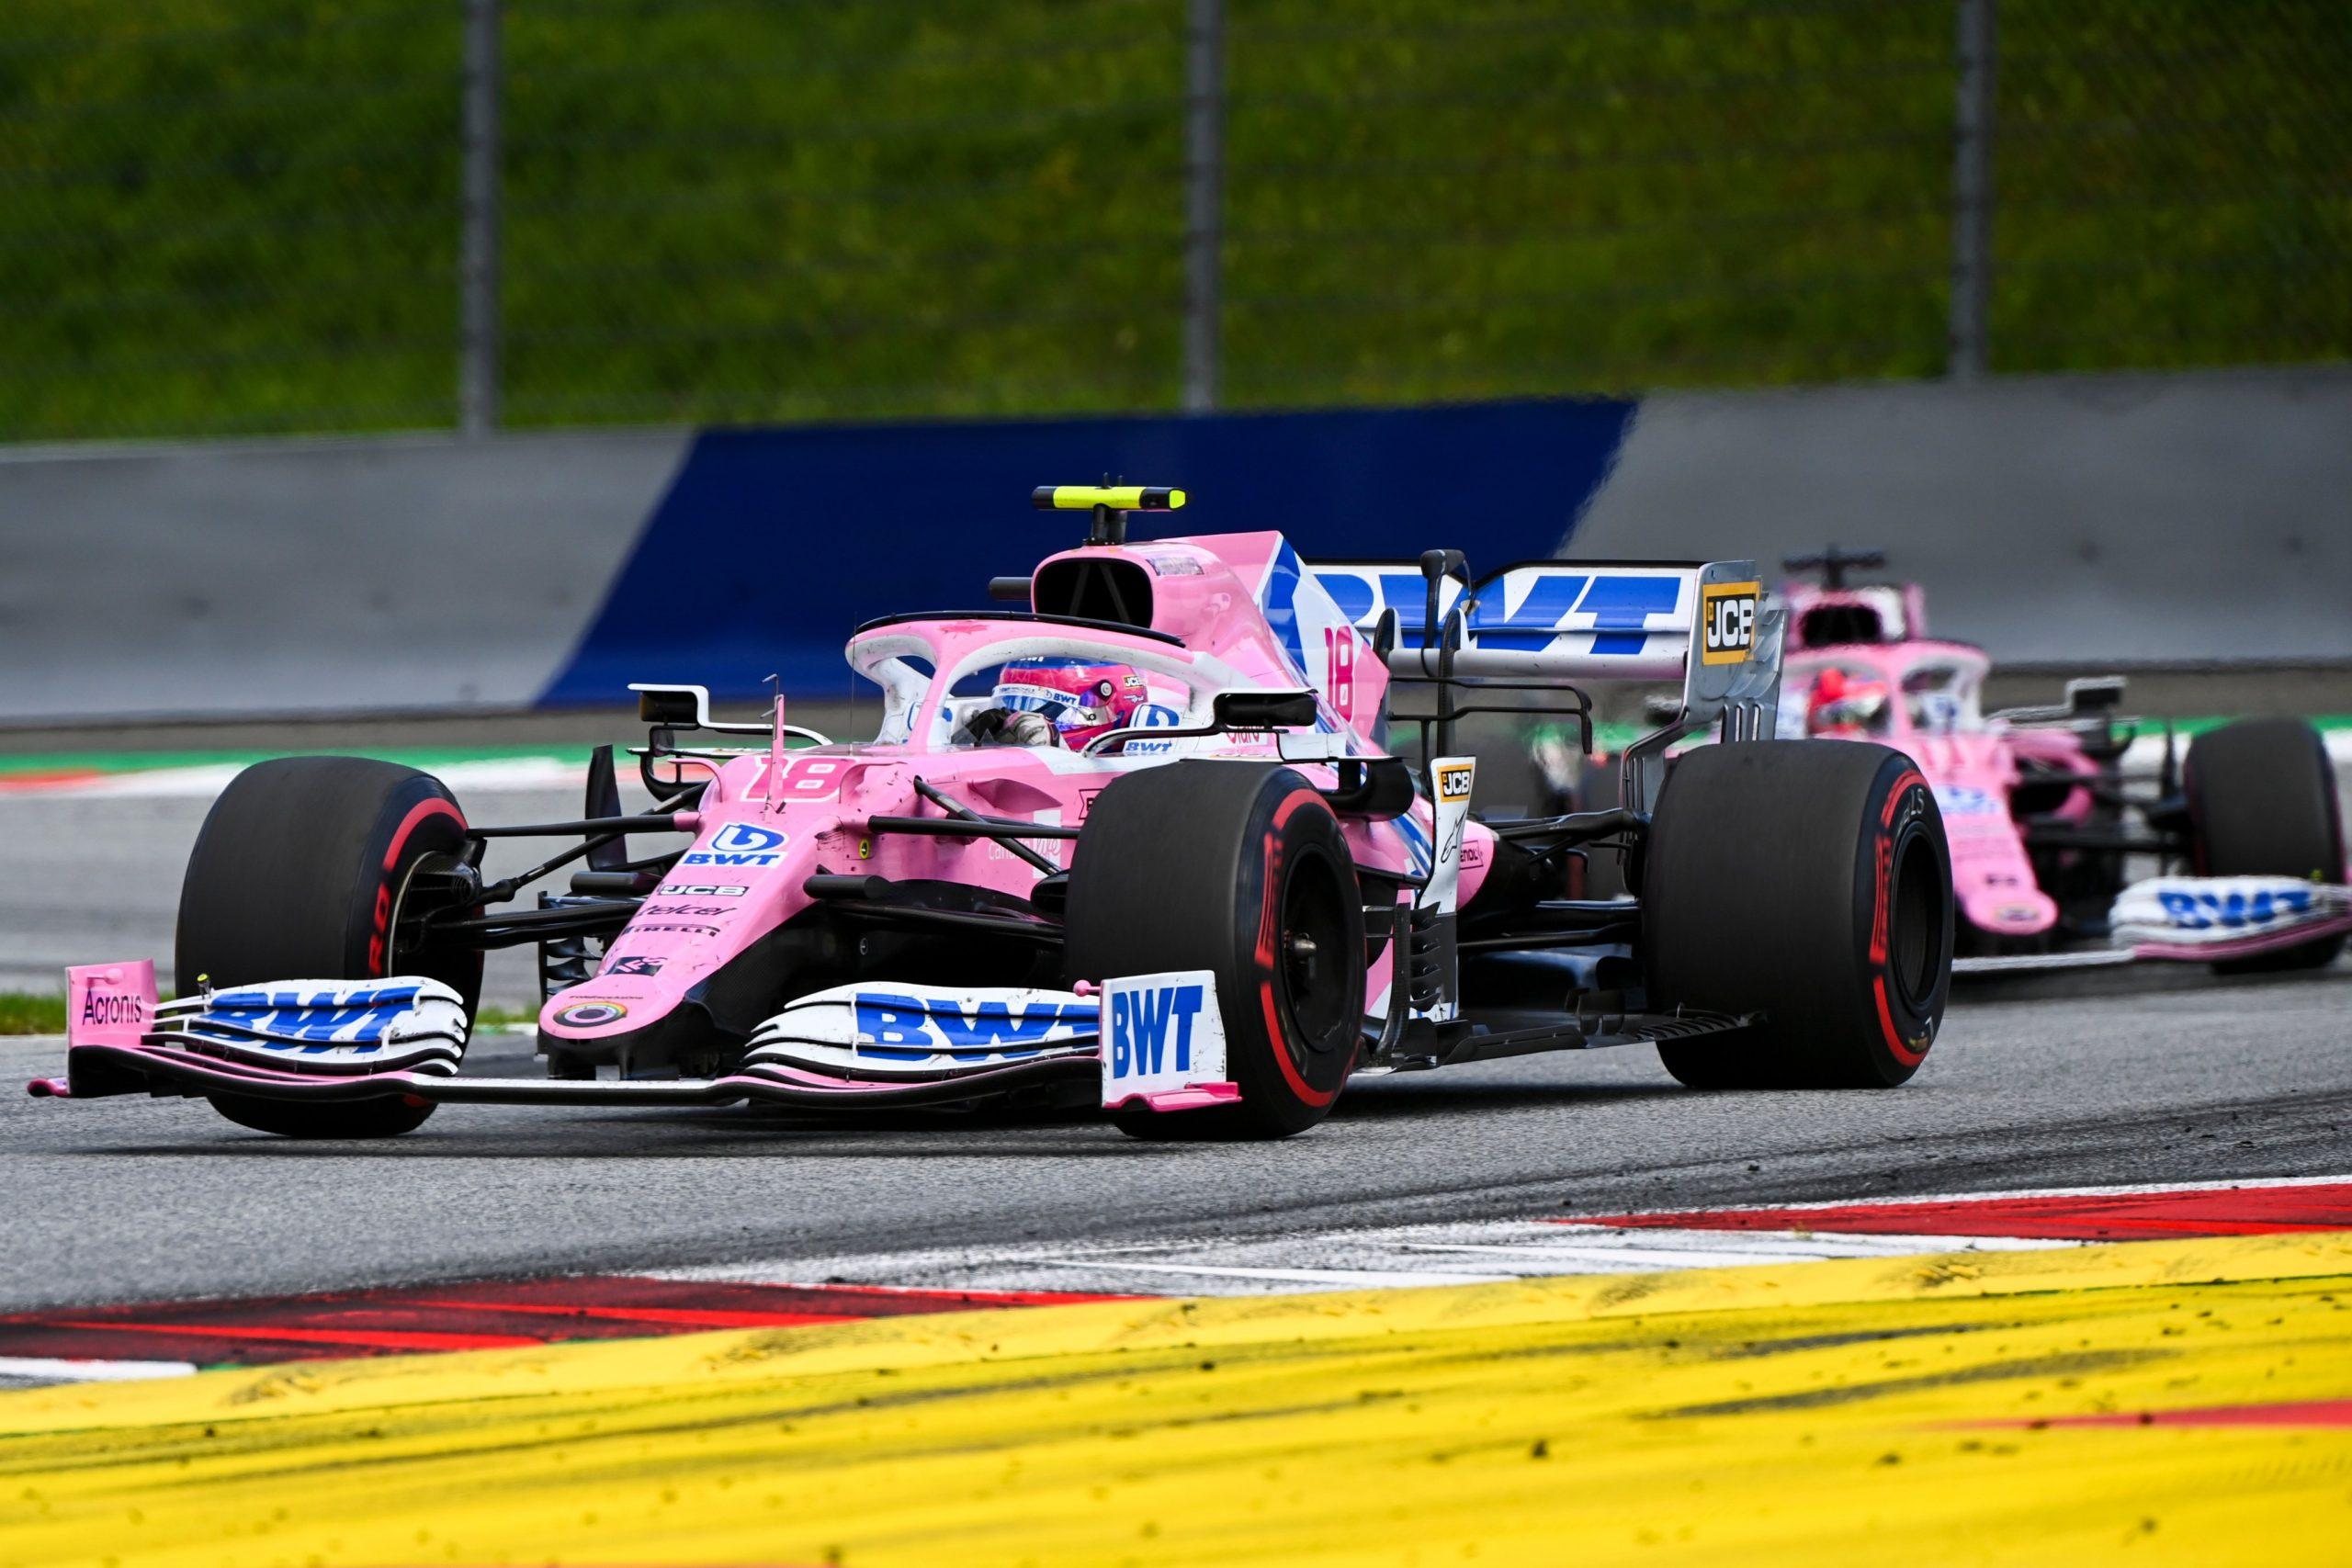 Racing Point, GP da Hungria 2020, Lance Stroll